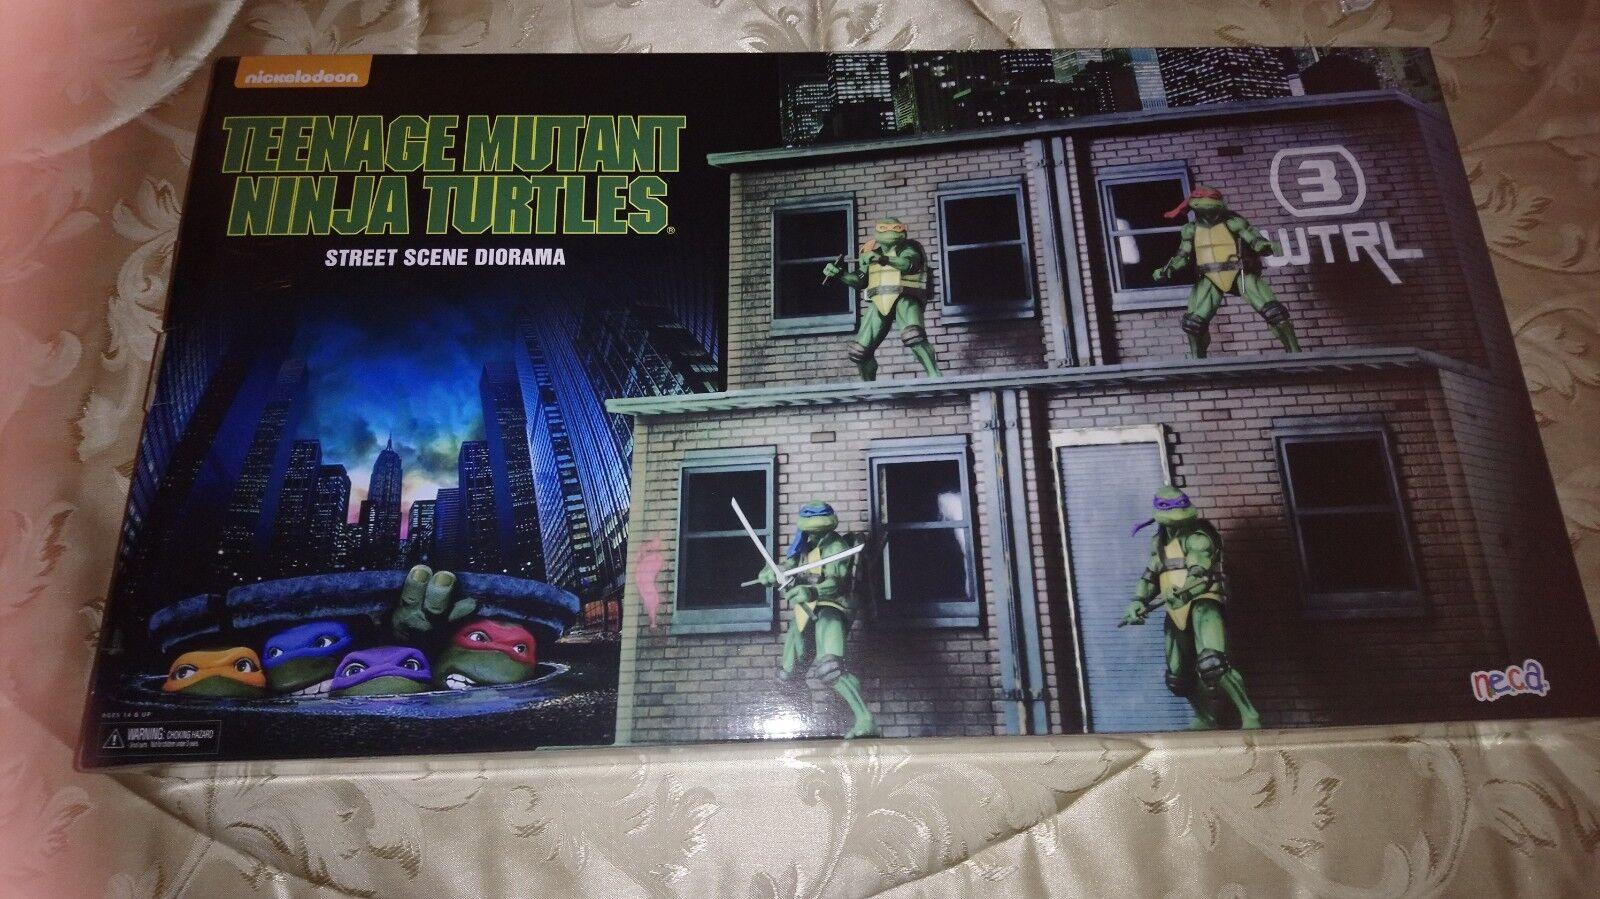 2018 NECA SDCC Exclusive Teenage Mutant Ninja Turtles Diorama and Figures LE2000